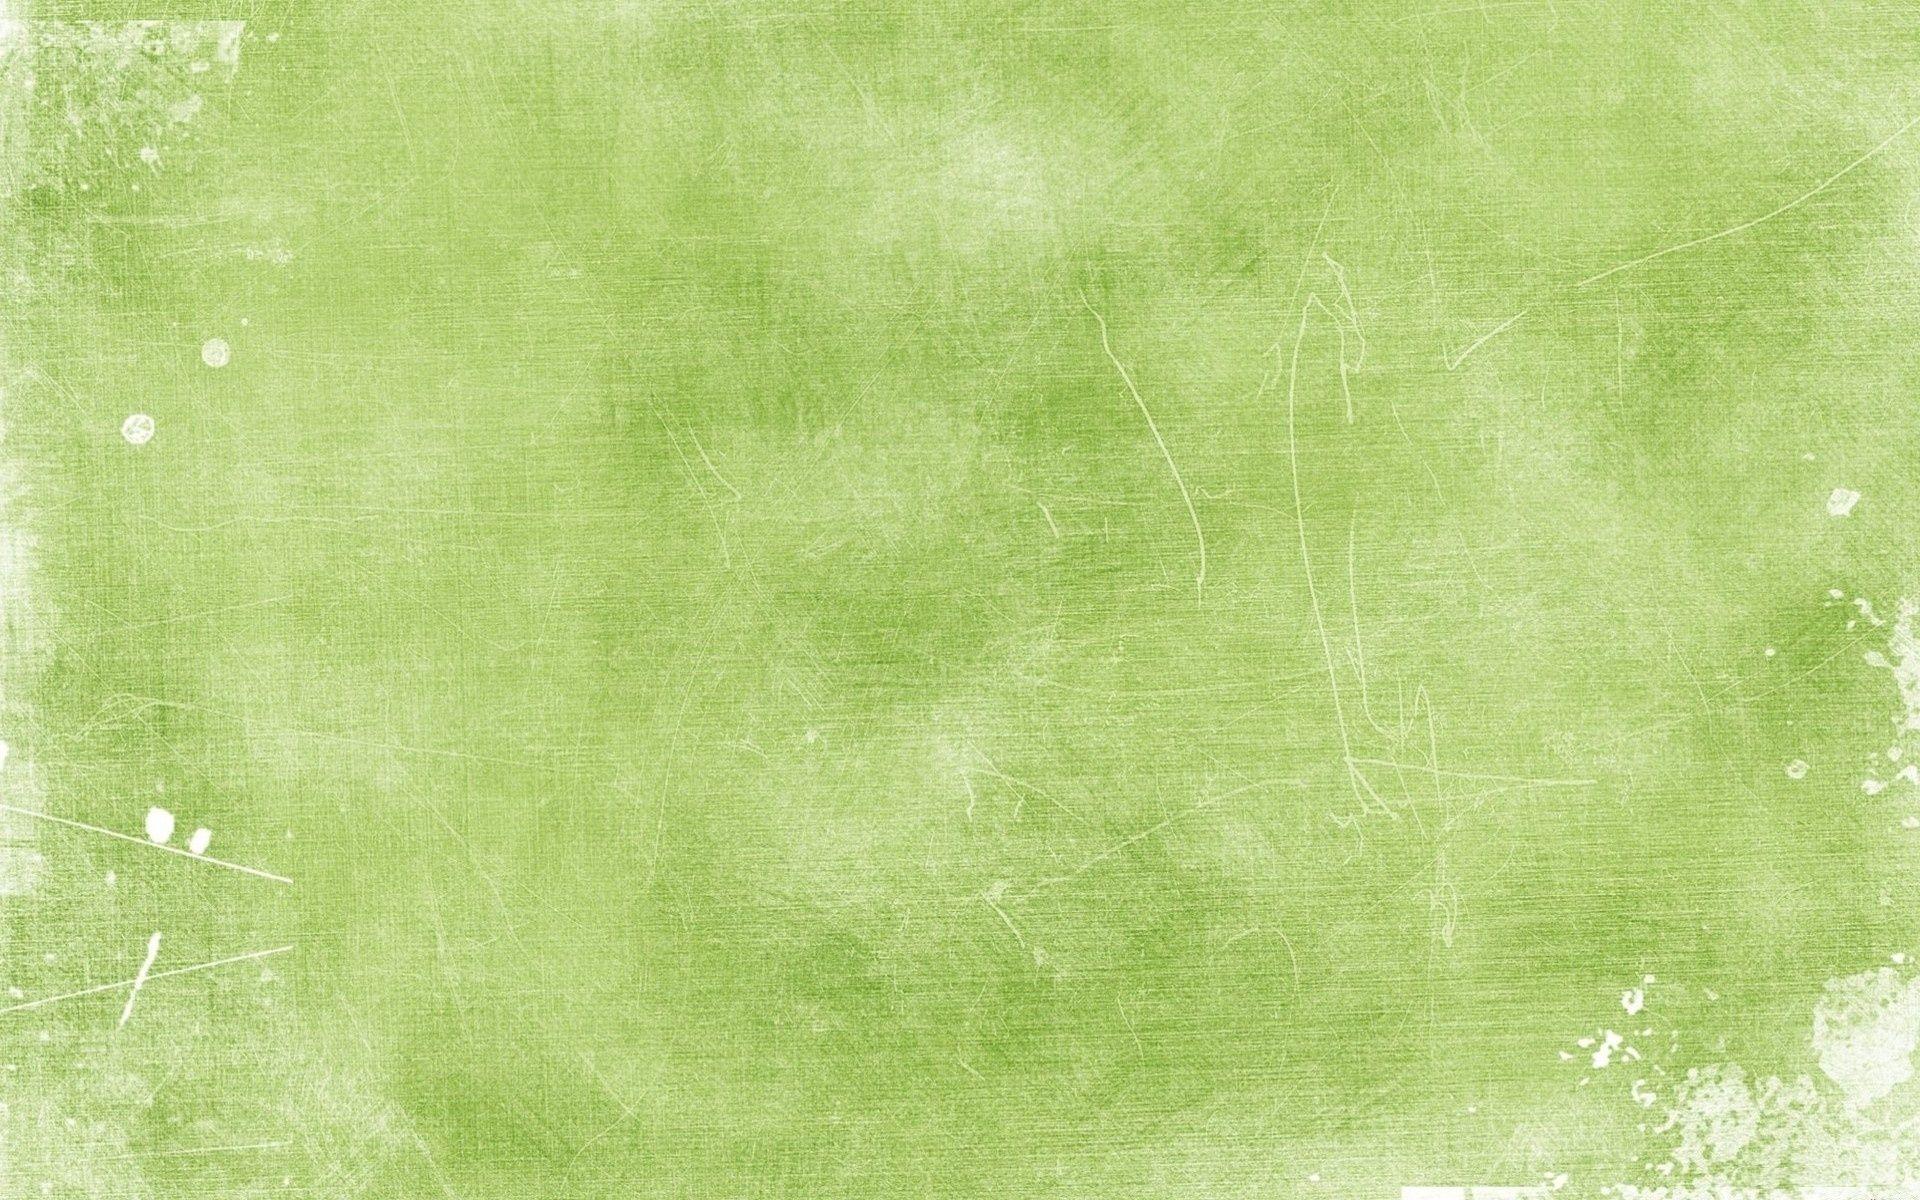 stains_light_background_texture_50519_1920x1200.jpg (1920